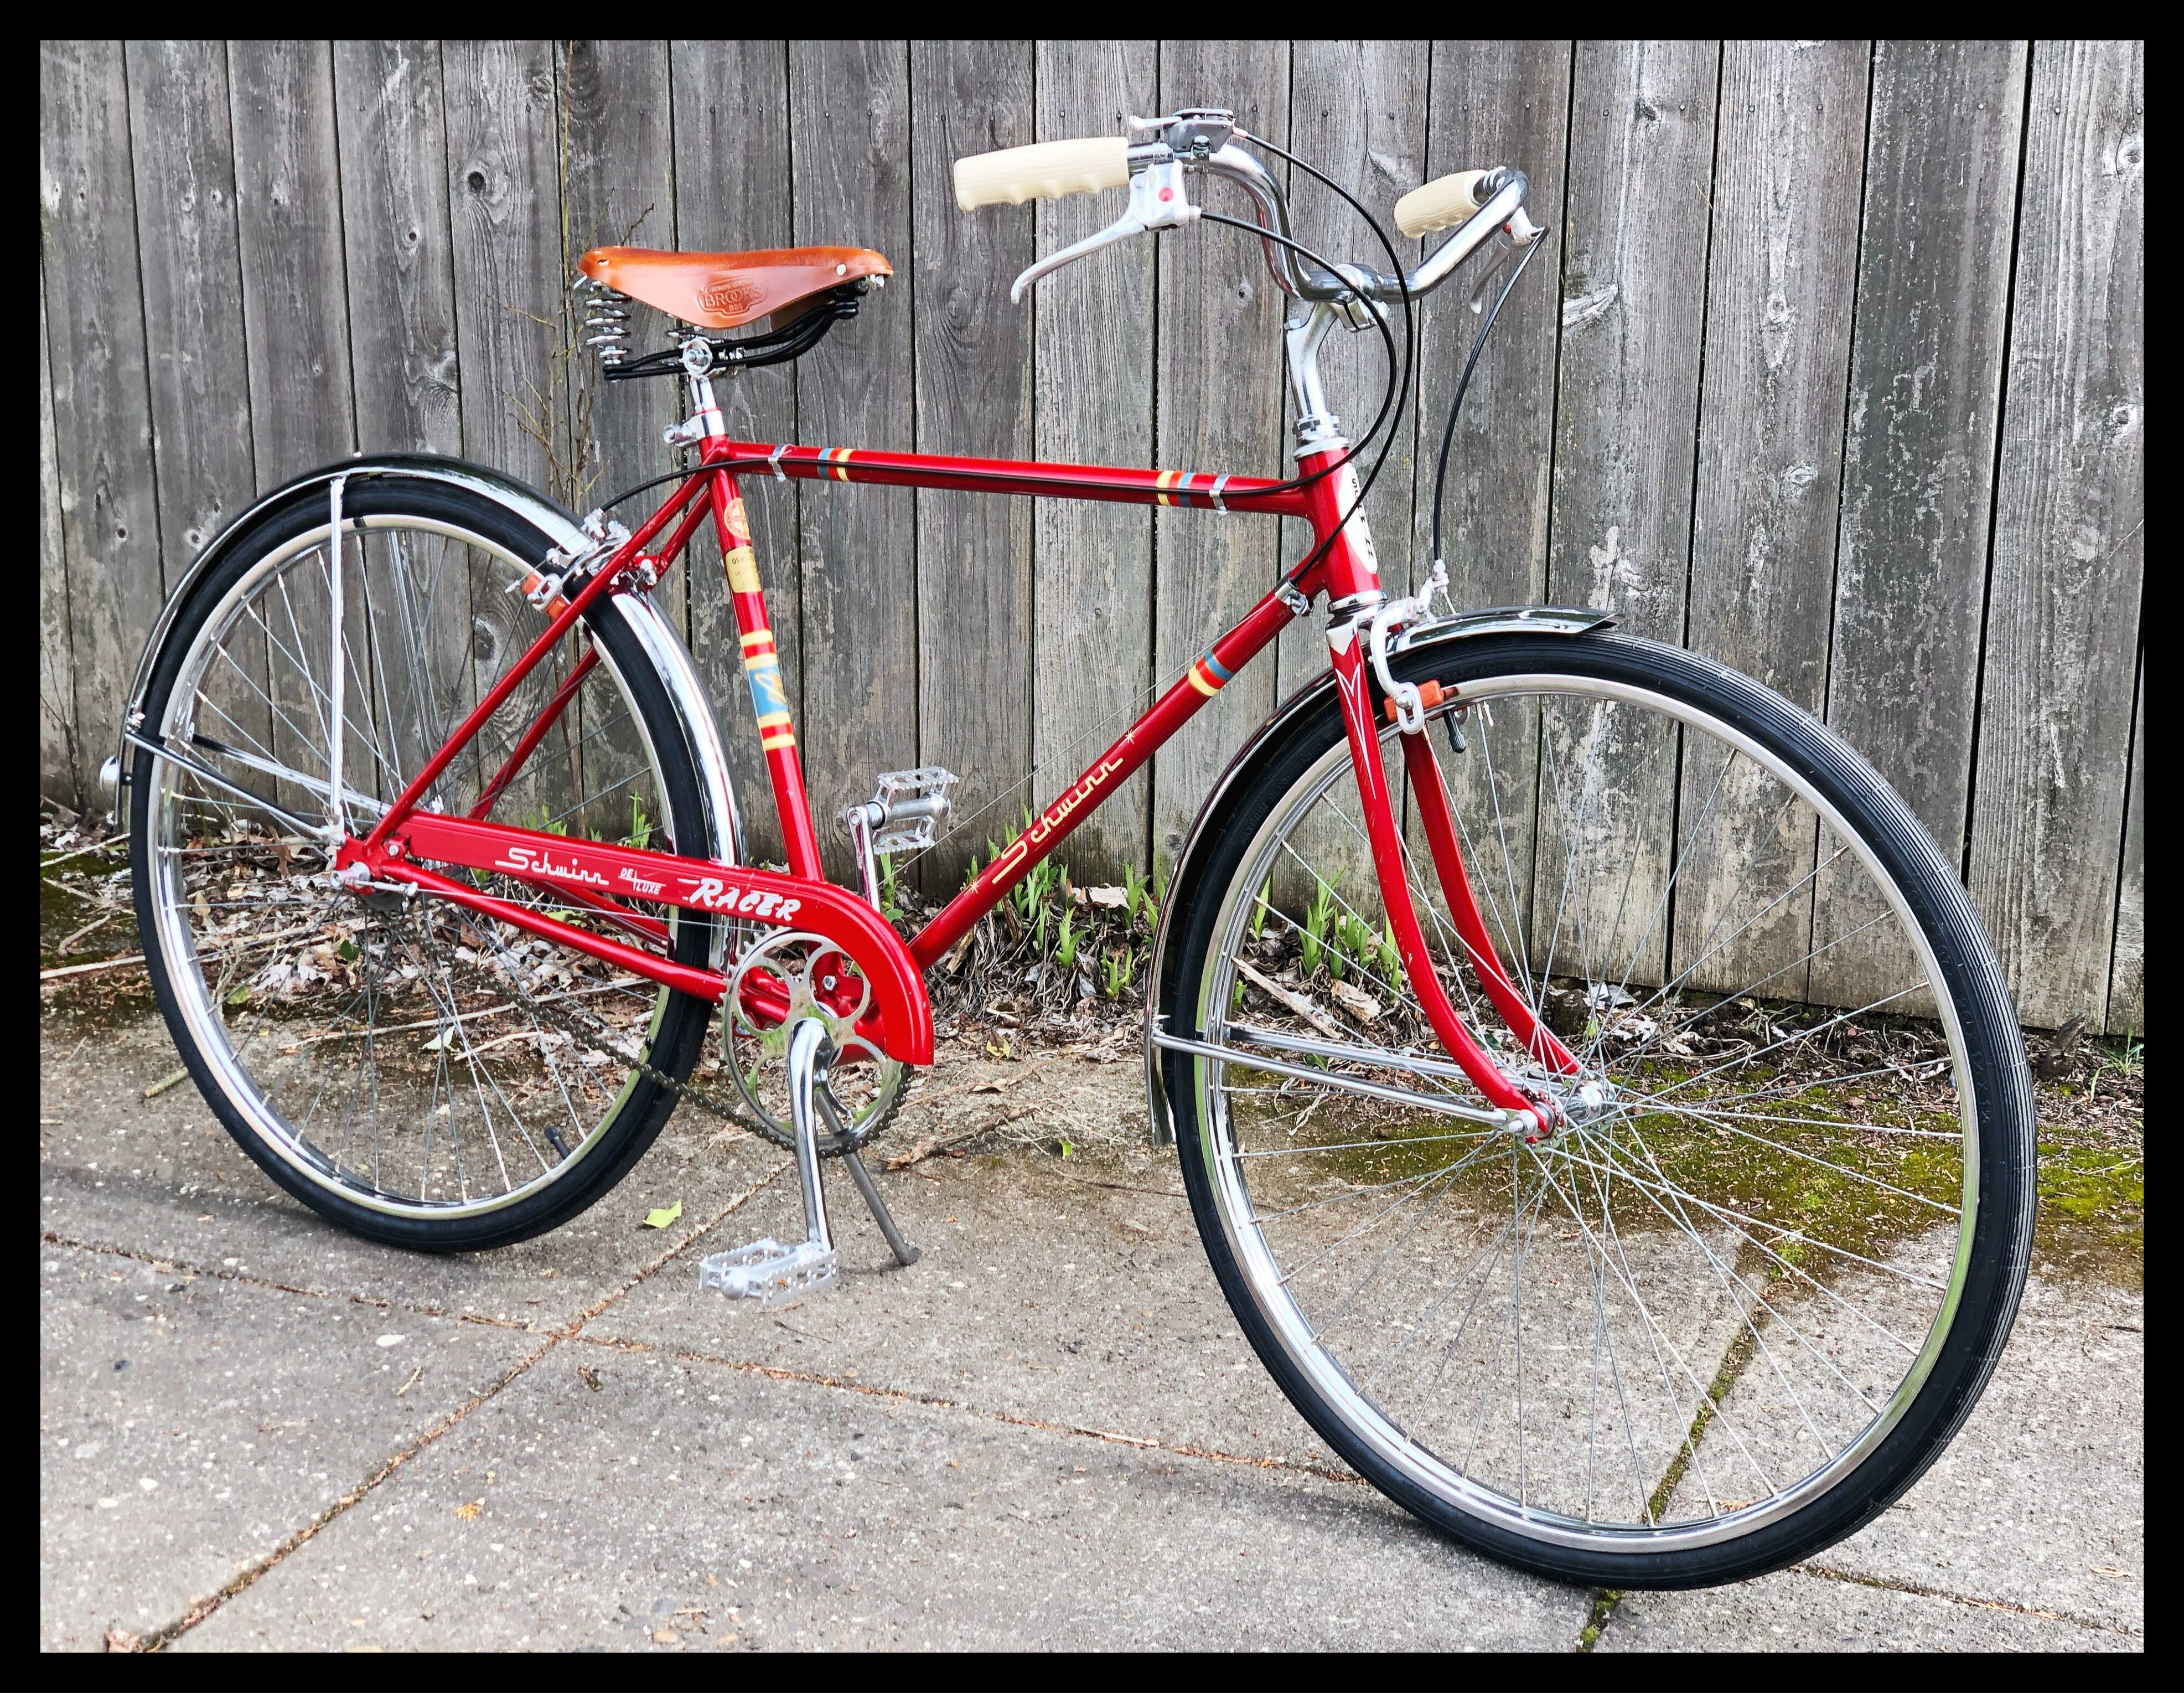 d420a8df056 1965 Schwinn Racer DeLuxe 3 speed | Bicycles | Bicycle, Bike, Sidecar